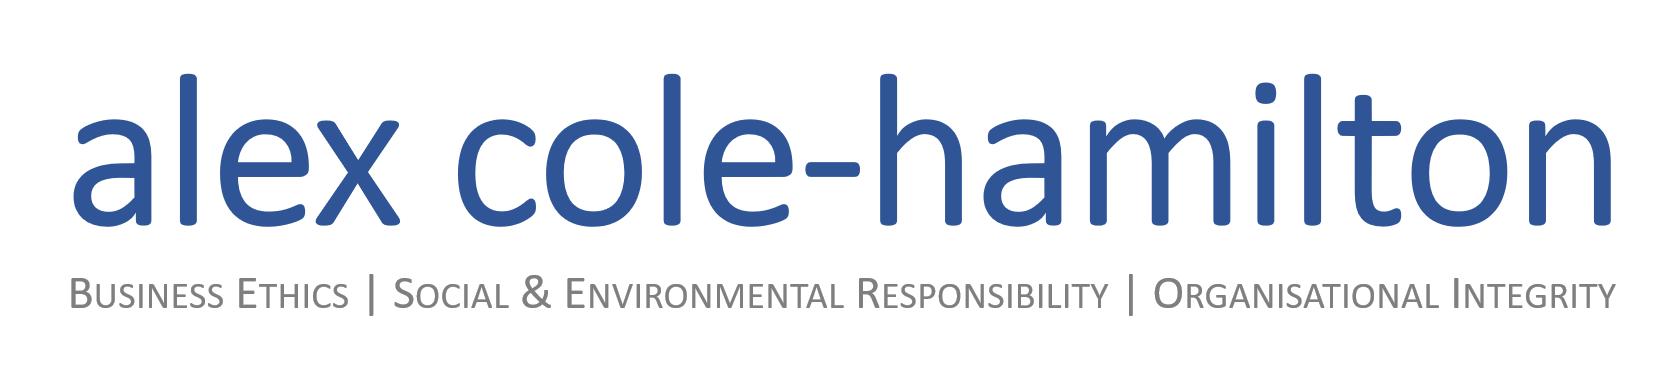 Alex Cole-Hamiliton | Organisational Integrity